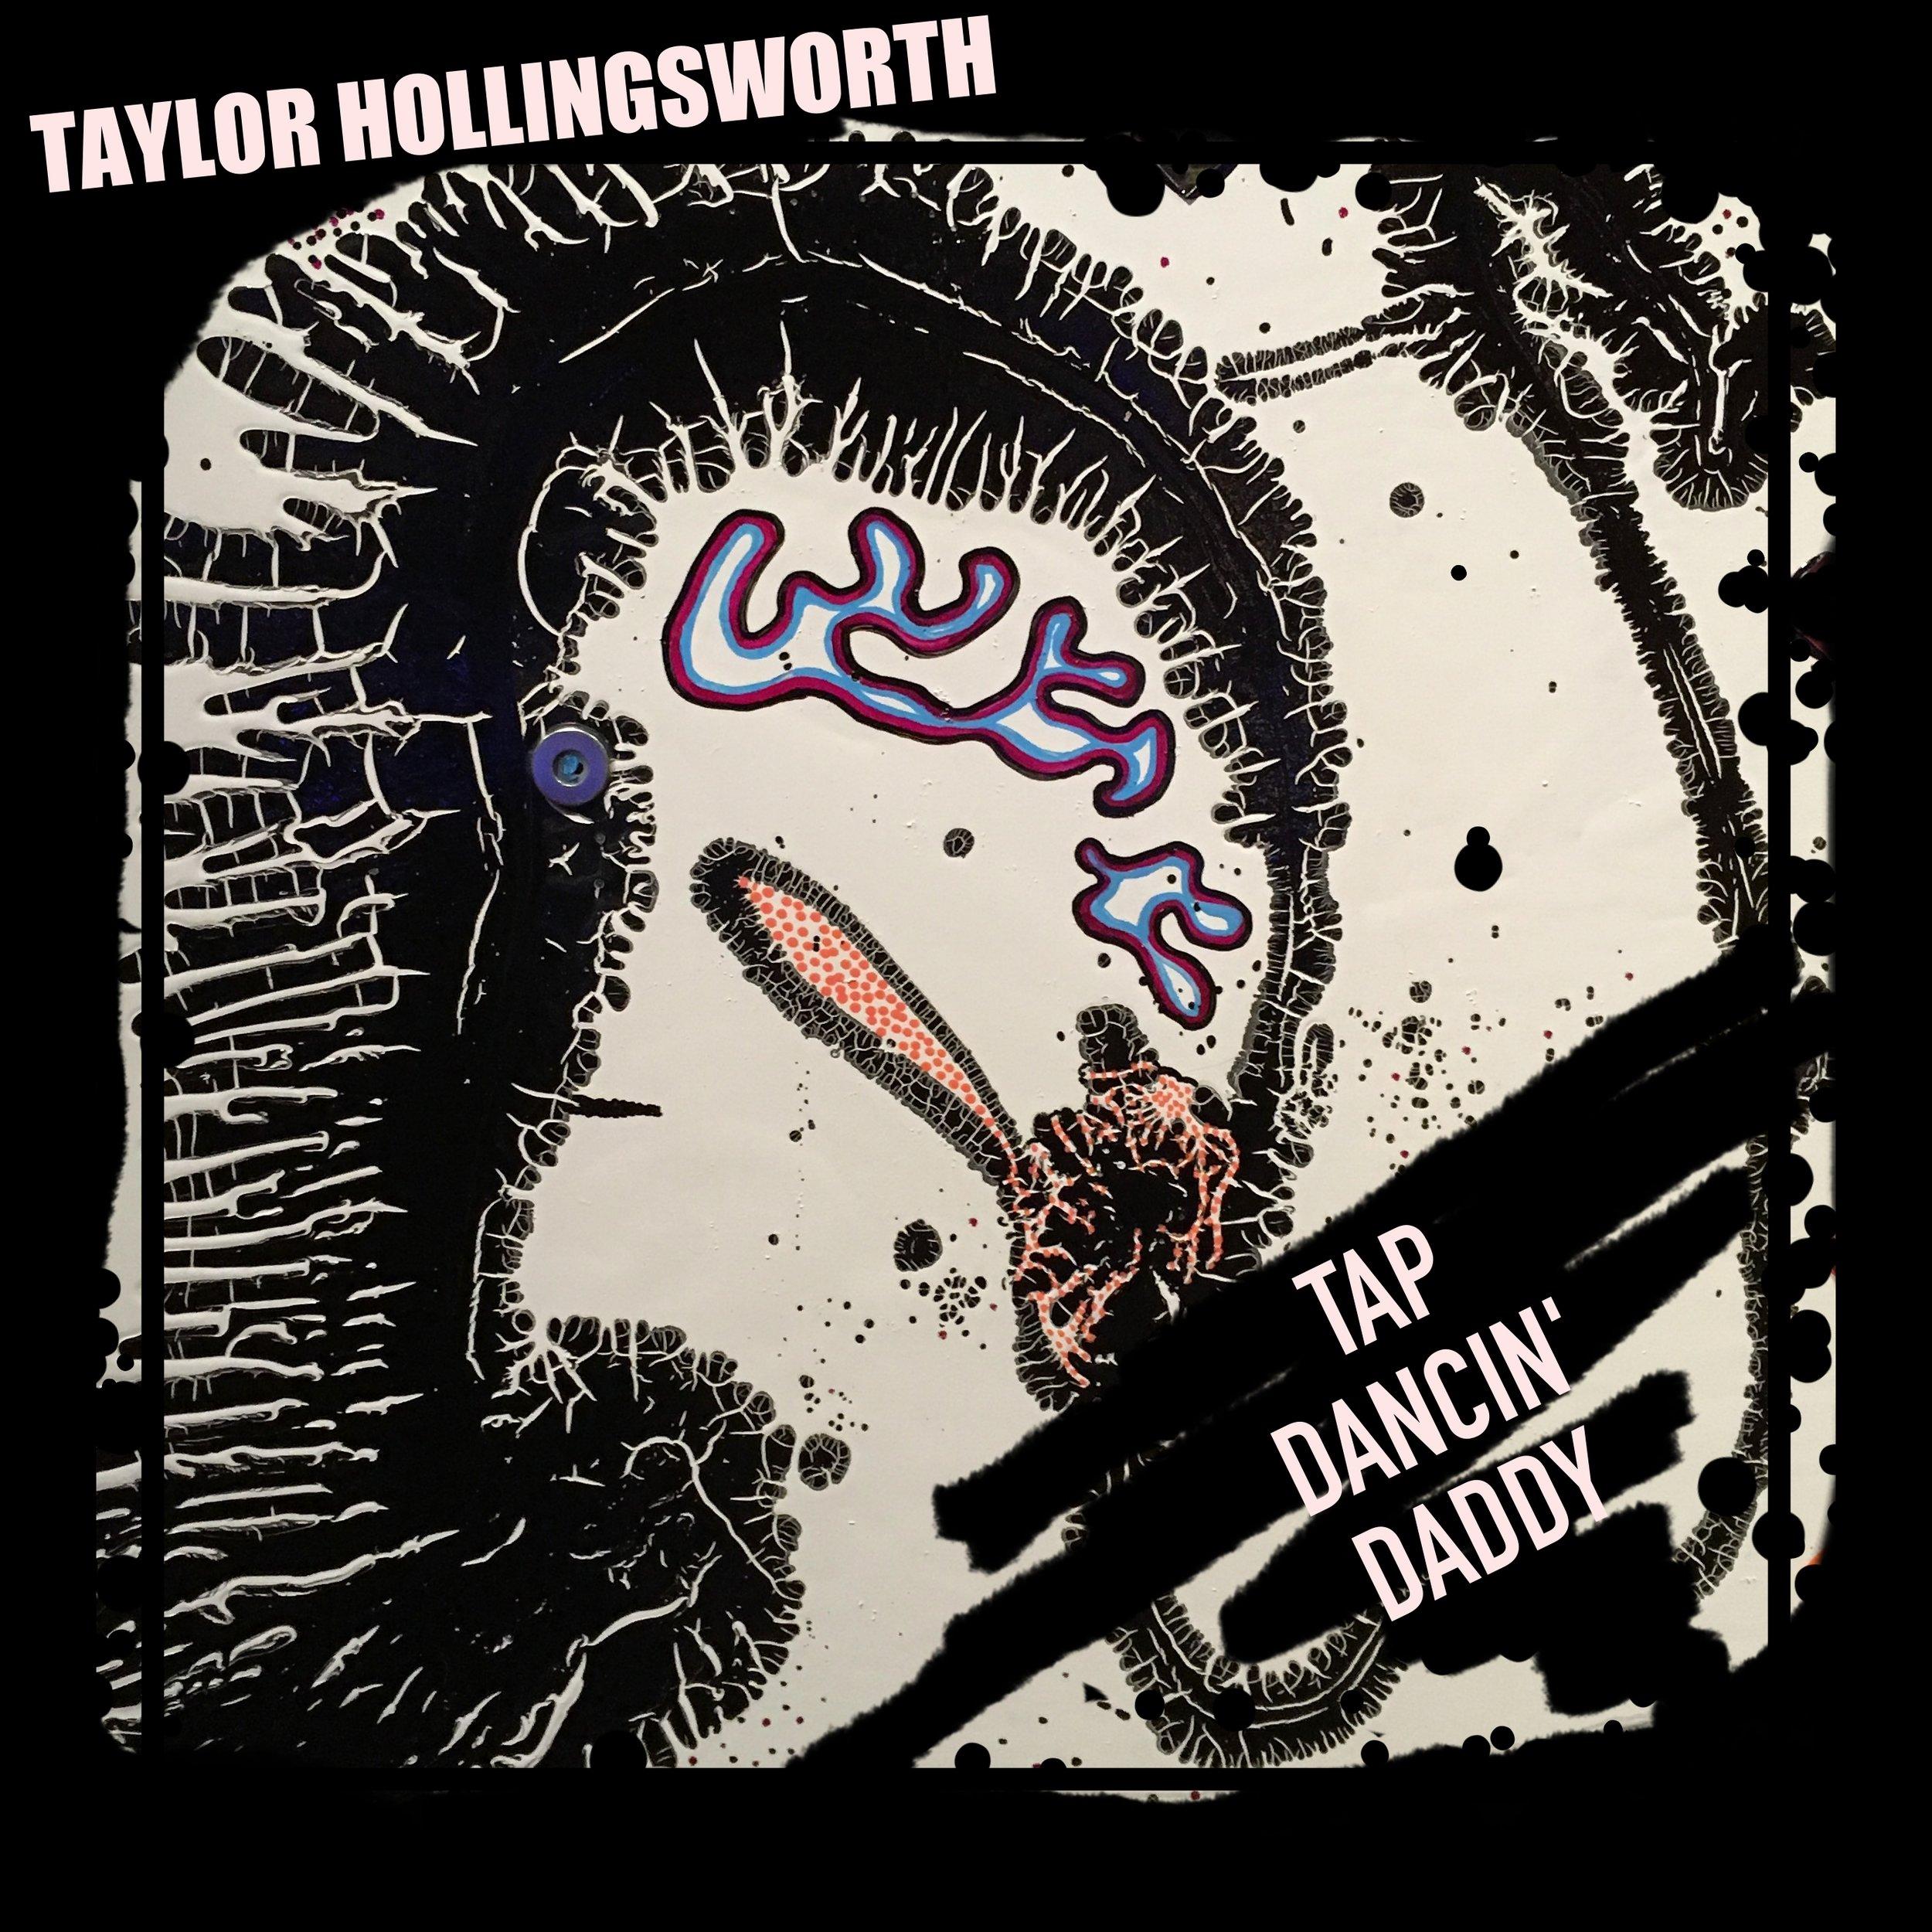 Taylor Hollingsworth – Tap Dancin Daddy ARTWORK - HIGH RES.jpg